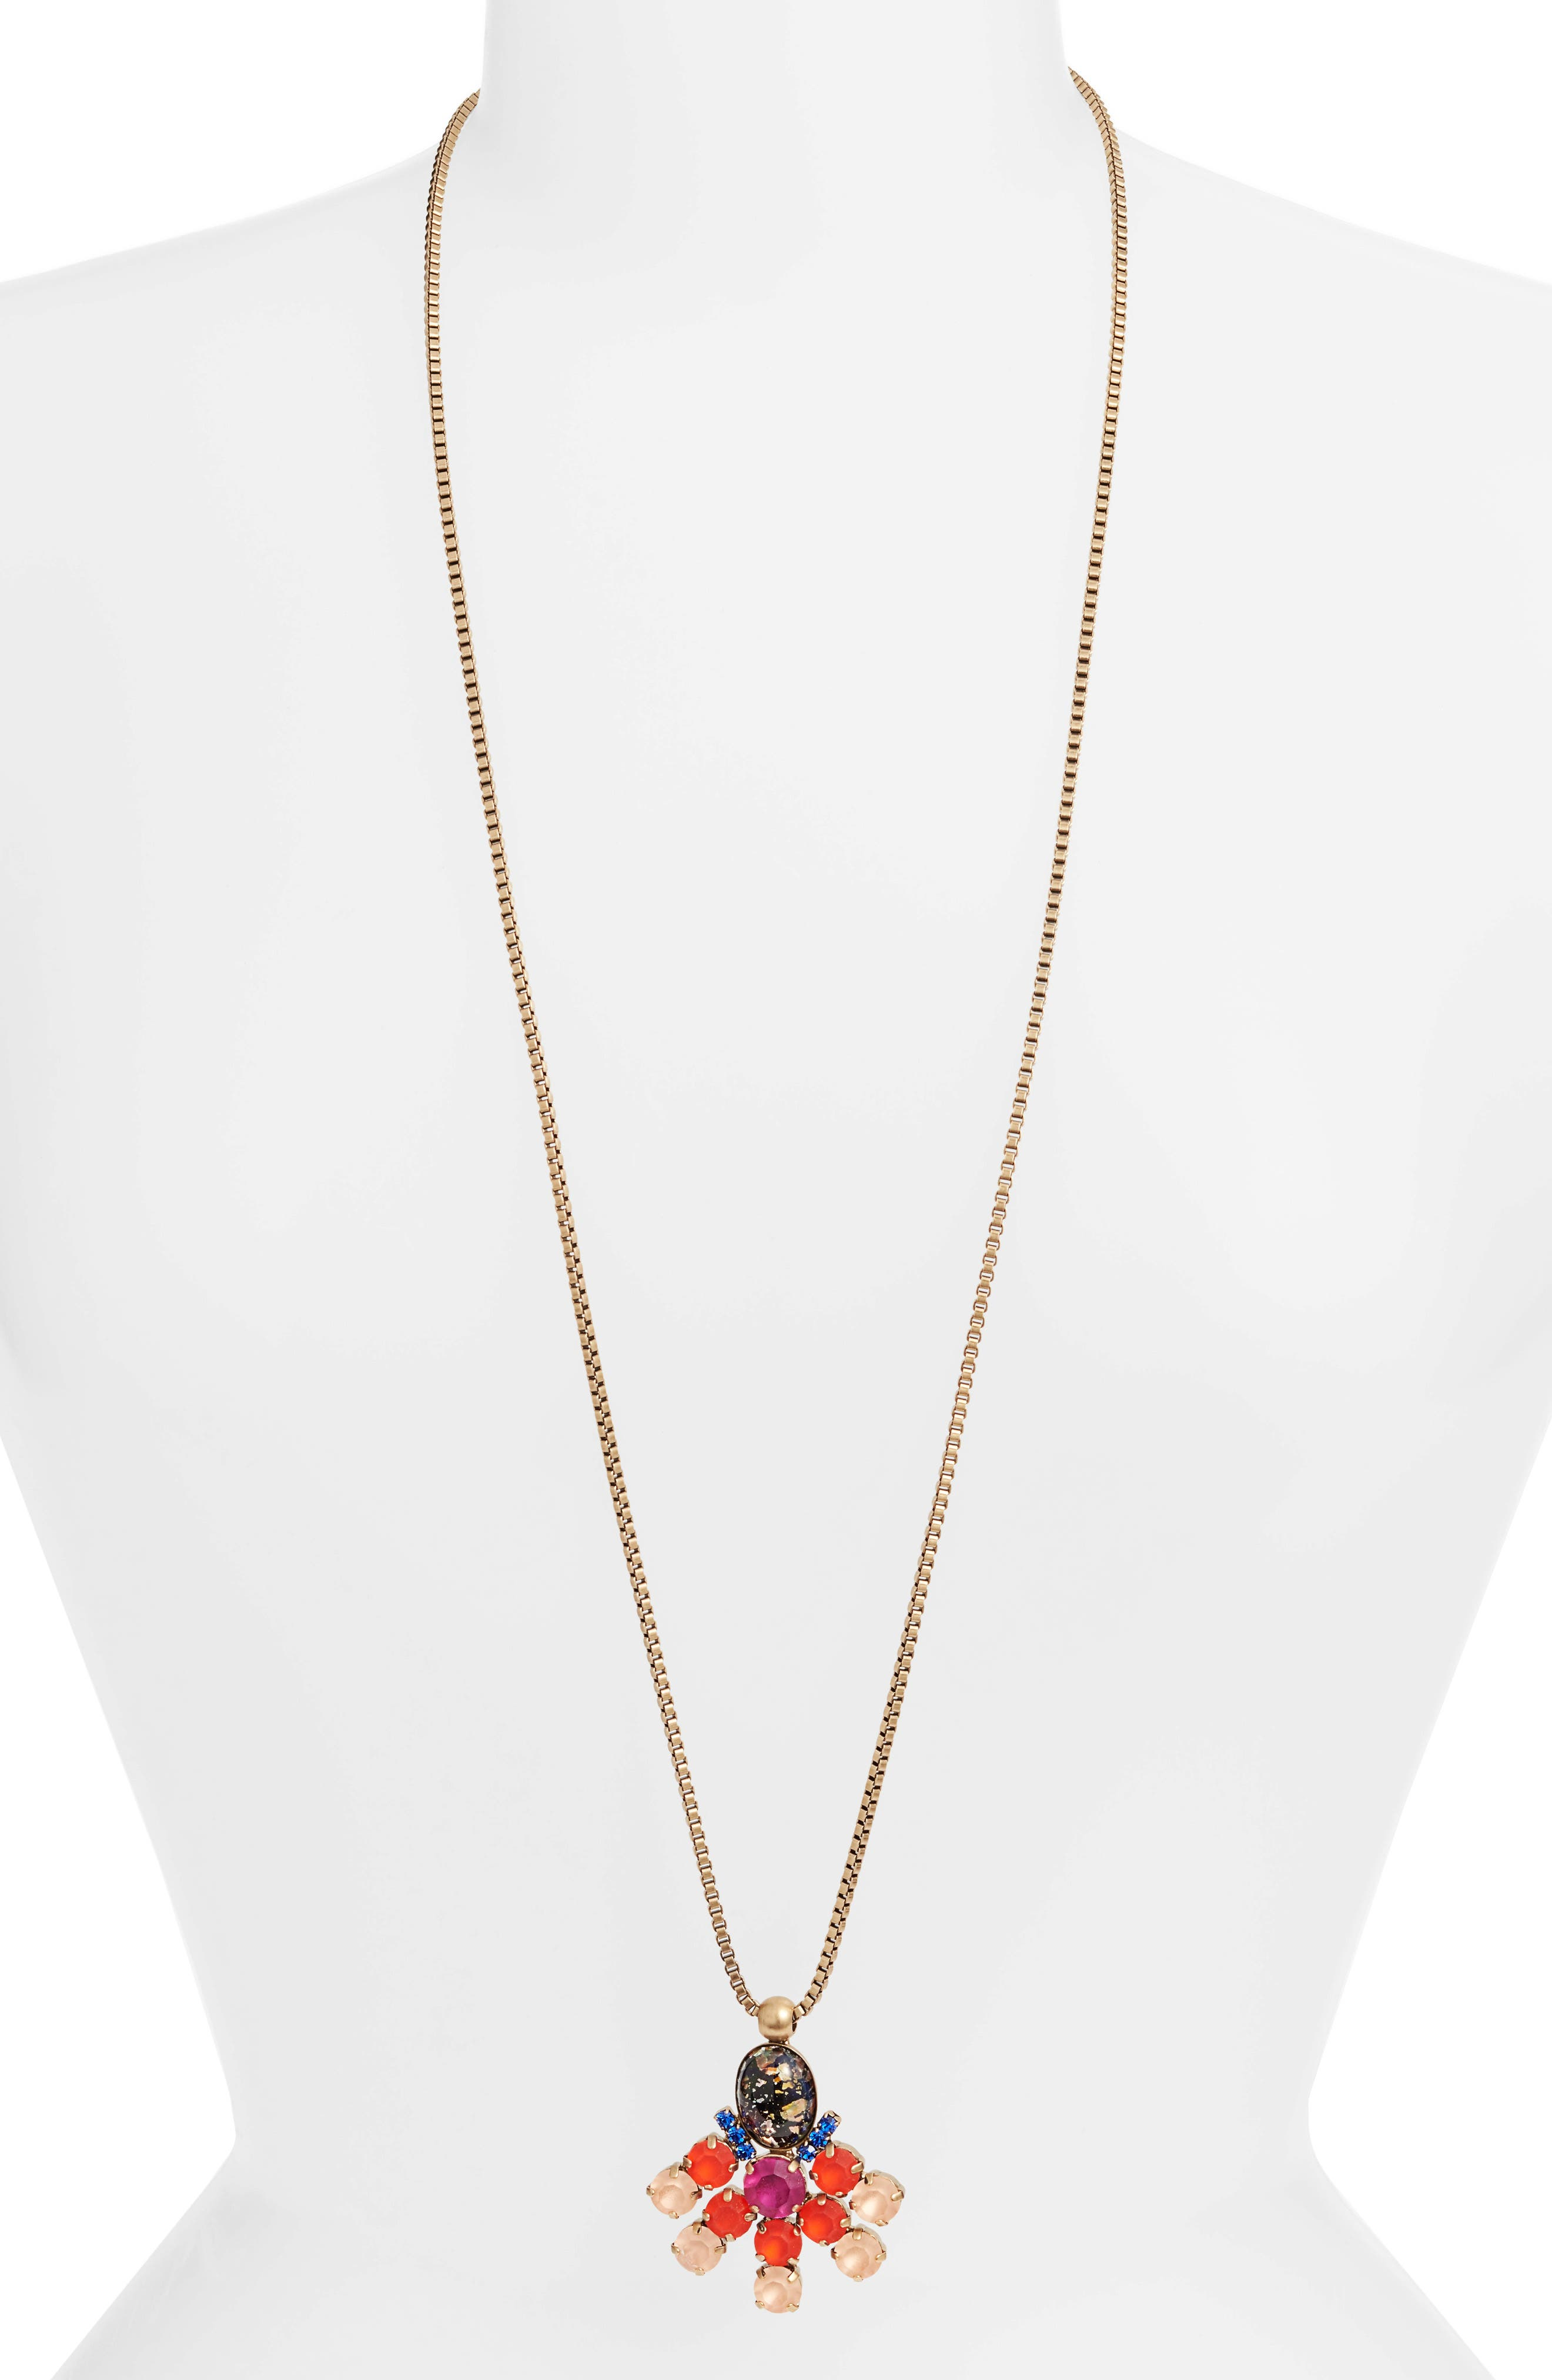 Lucy Long Pendant Necklace,                             Main thumbnail 1, color,                             GOLD MULTI